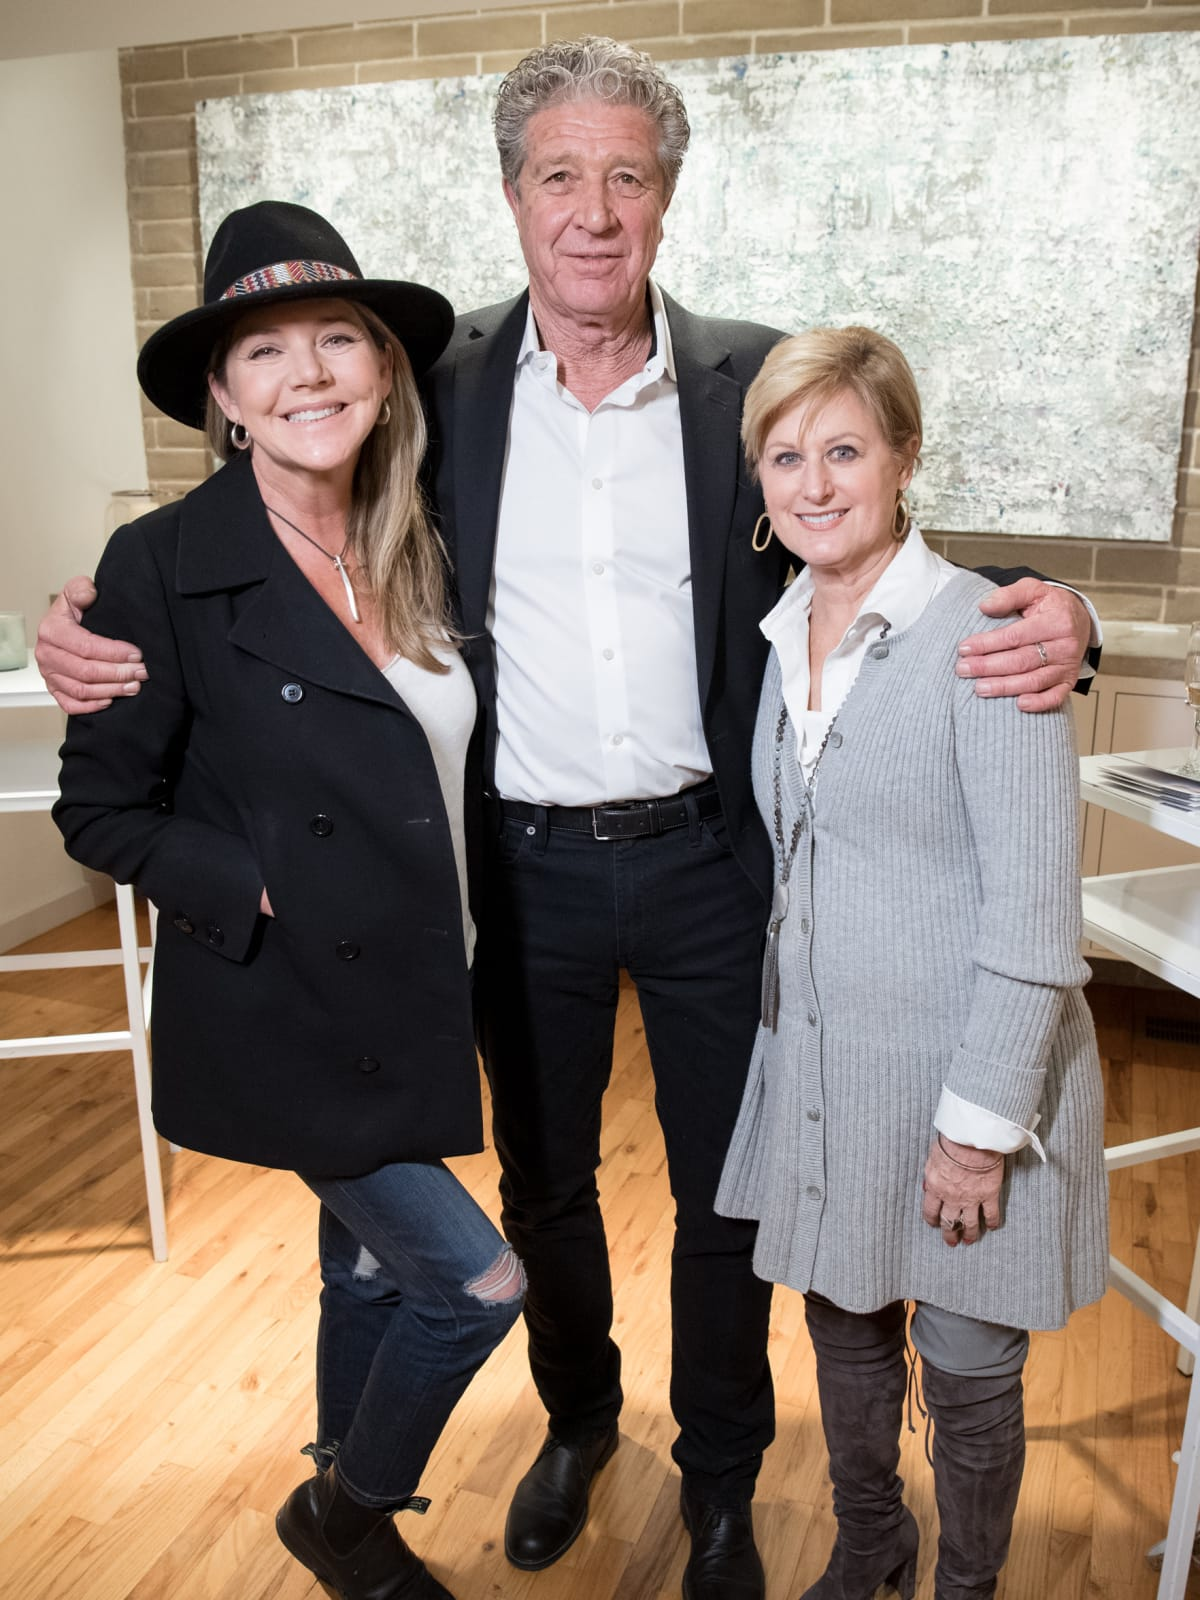 Dallas, LR Art House opening, January 2018, Mary Amons, Brad Hillinger, Kathy Leonard